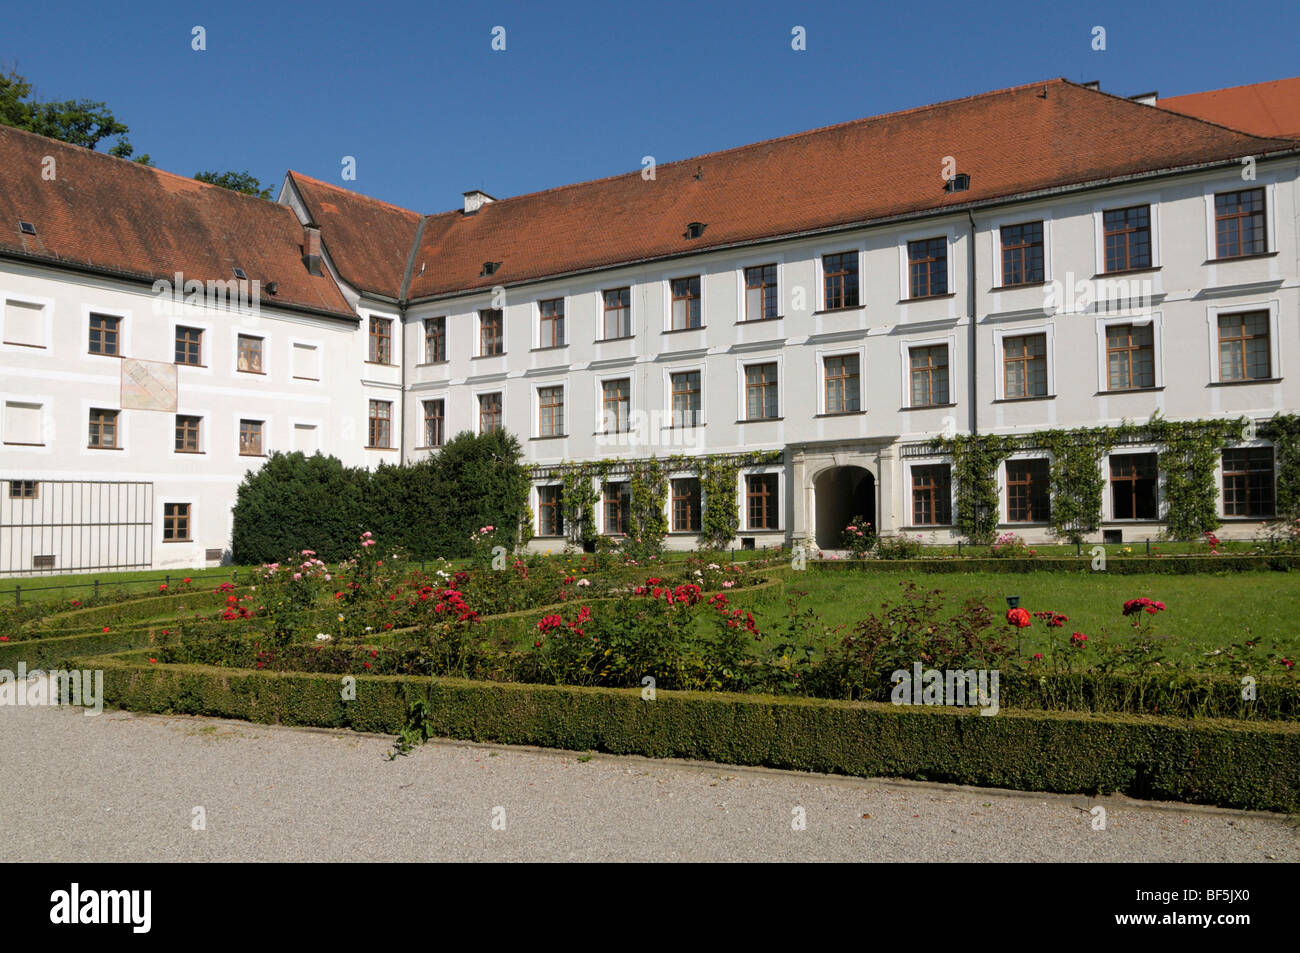 Augustine Monastery Herrenchiemsee, Old Palace, Herreninsel, Gentleman's Island, Lake Chiemsee, Bavaria, Germany, - Stock Image